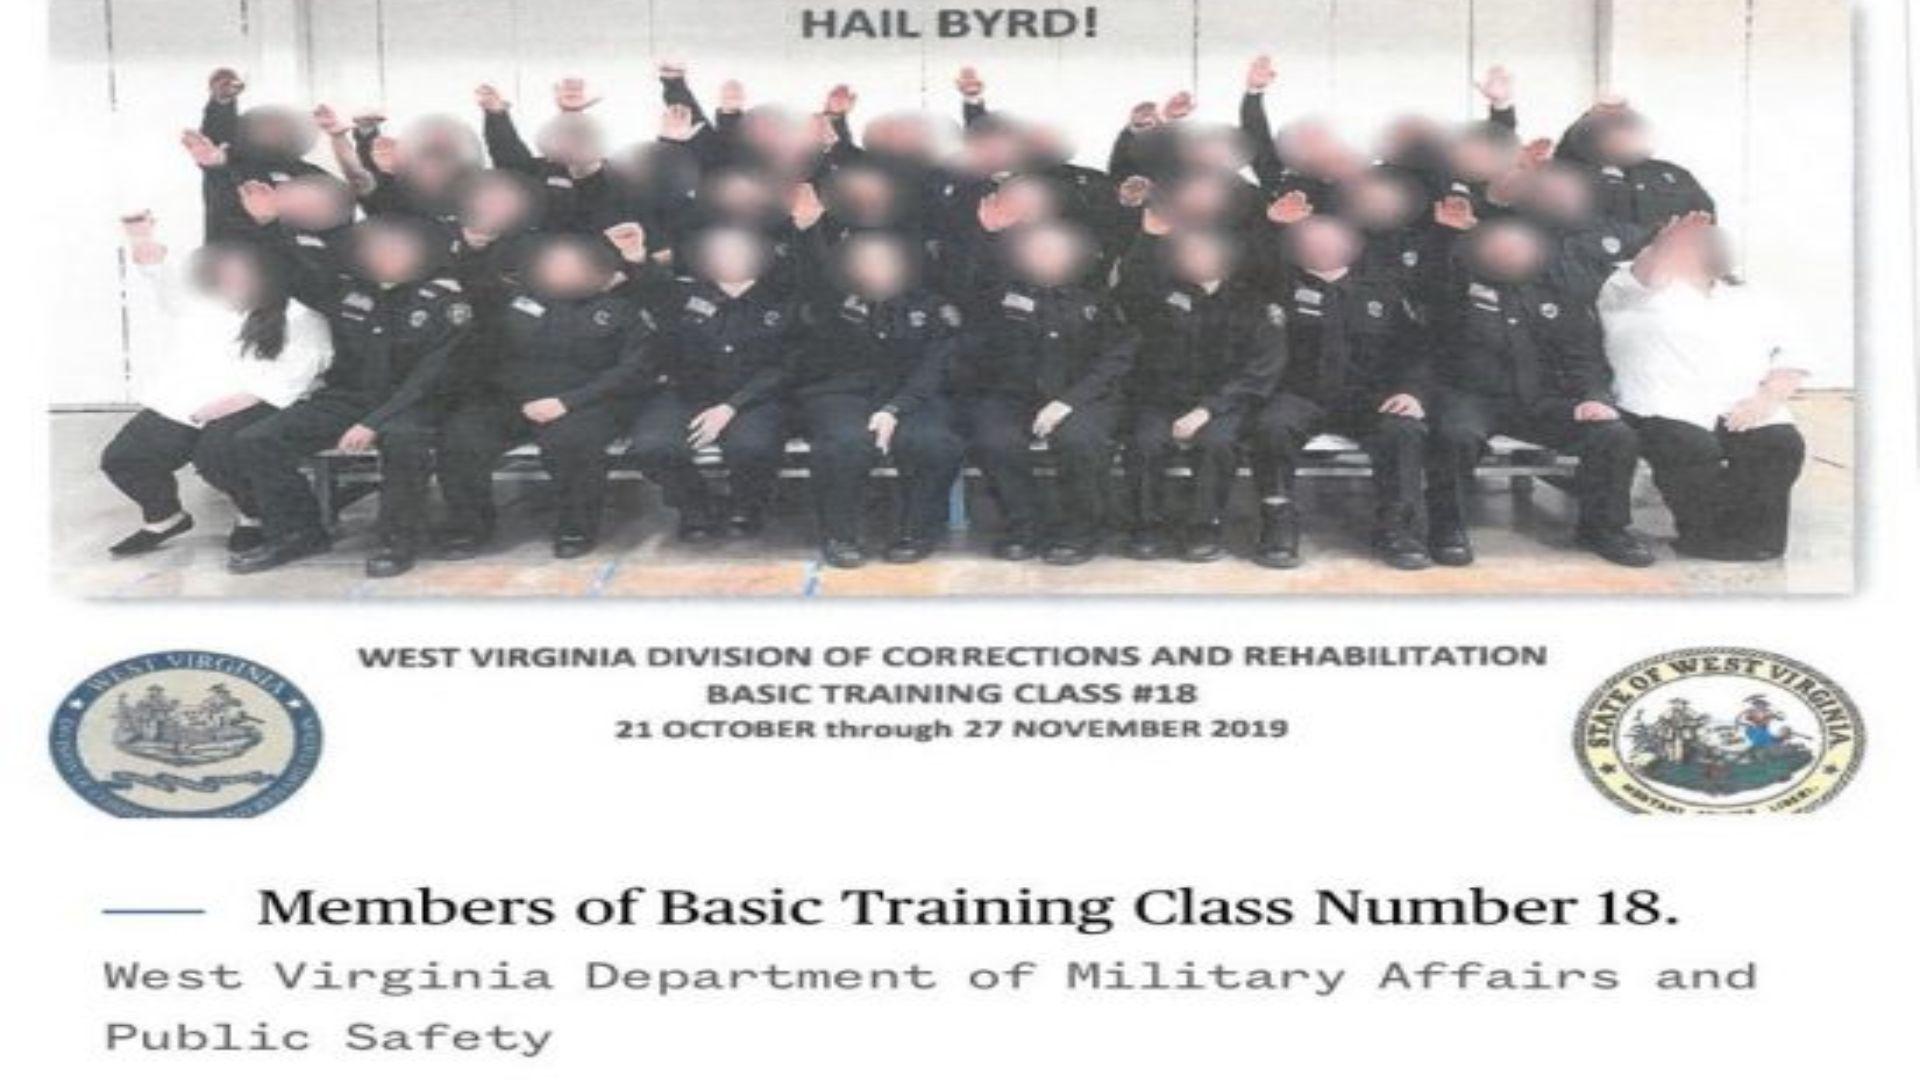 wv-DoC-nazi-salute-1920x1080